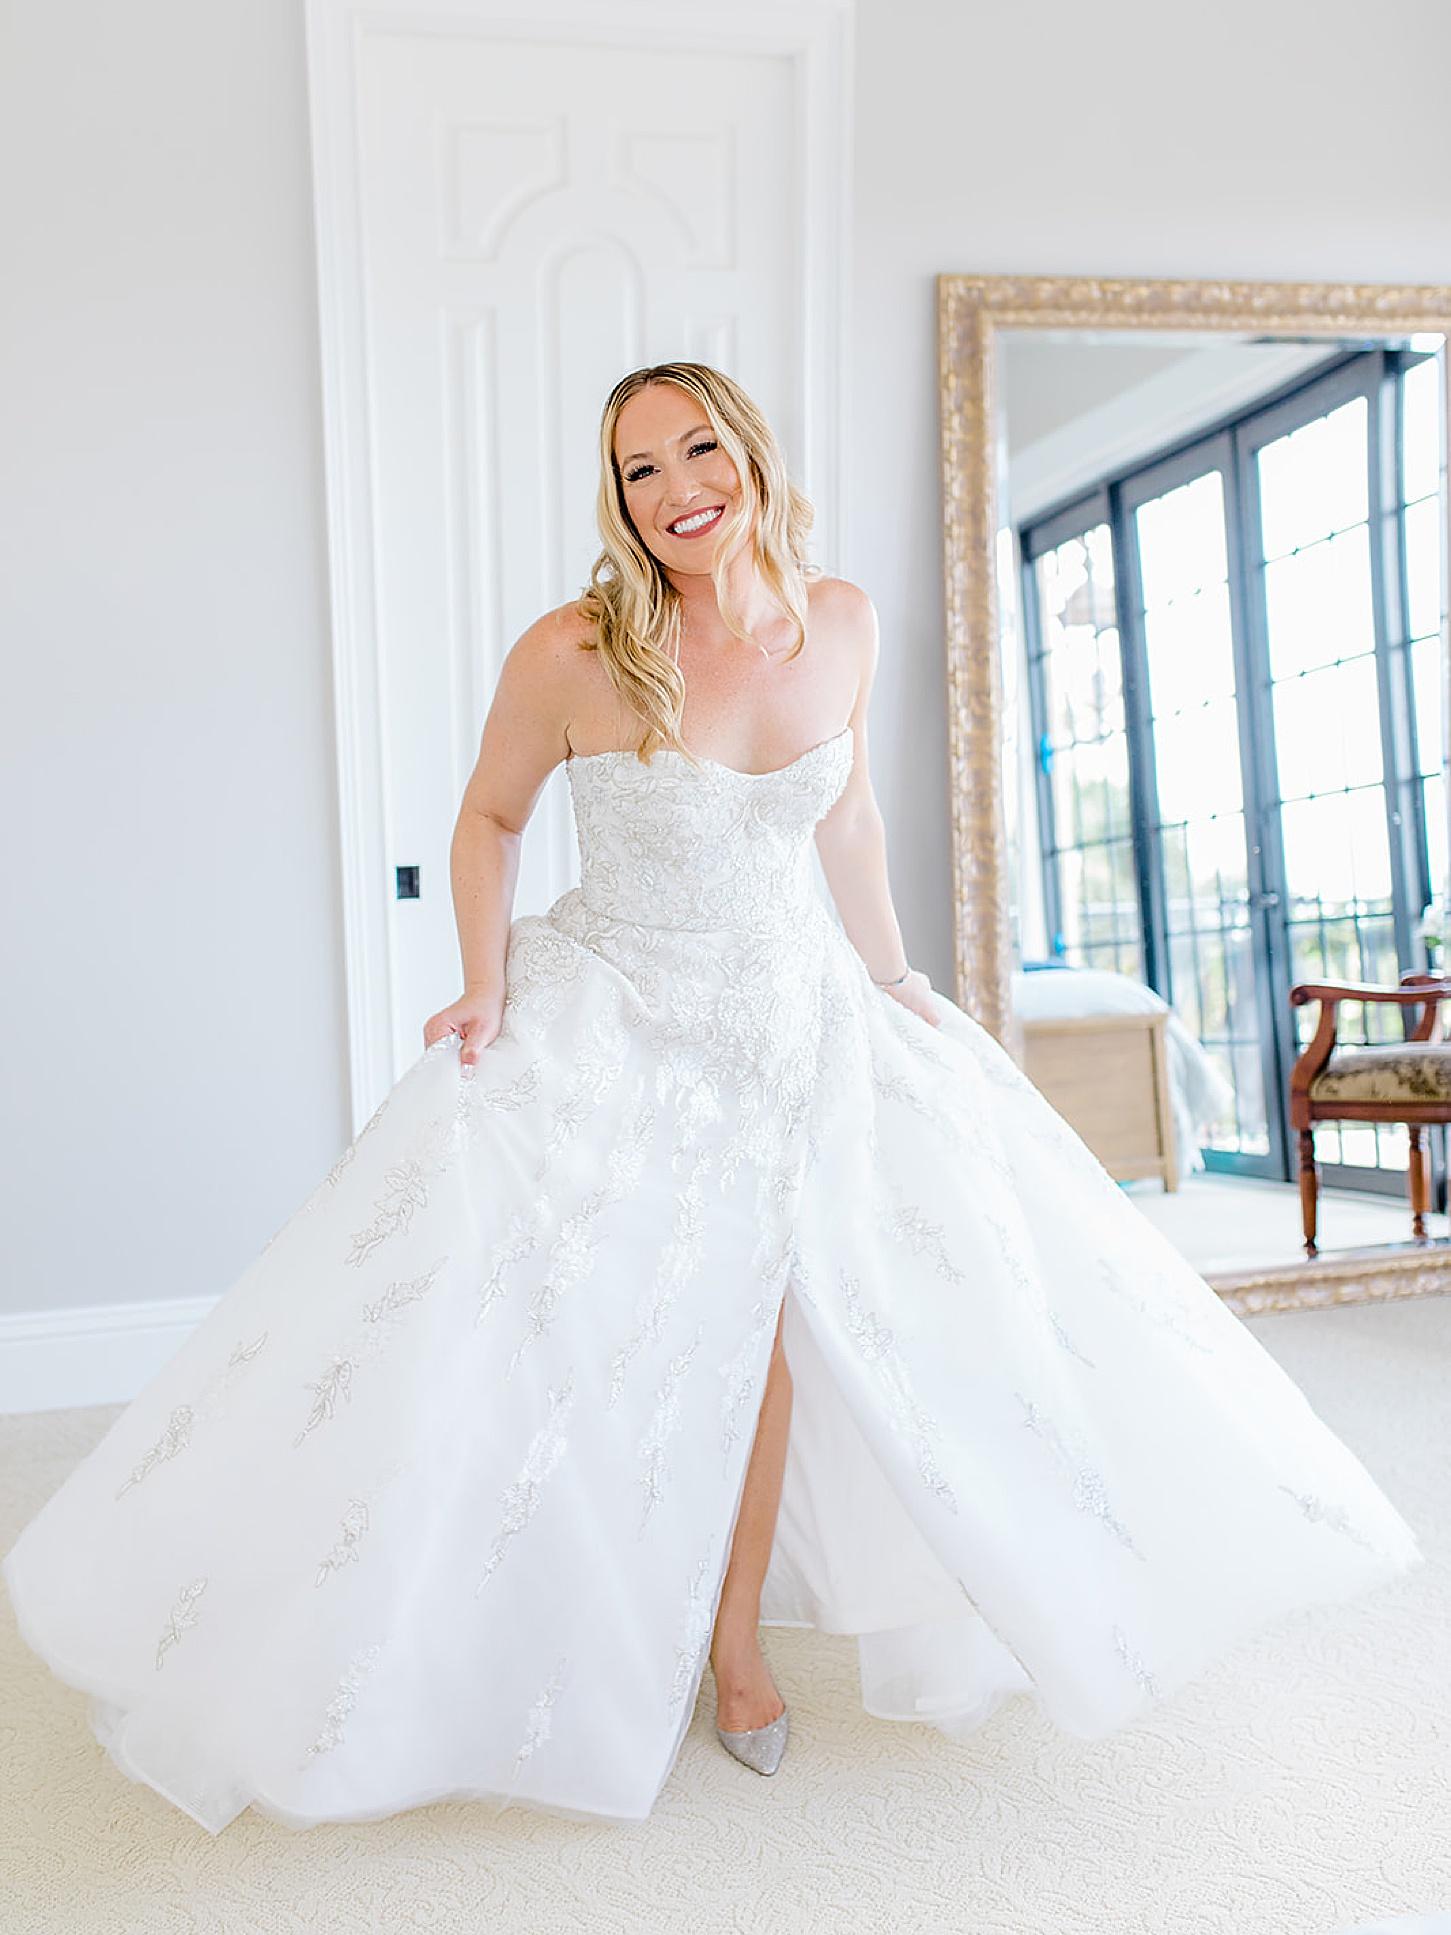 Marco Island Florida Wedding Photography by Magdalena Studios 0012